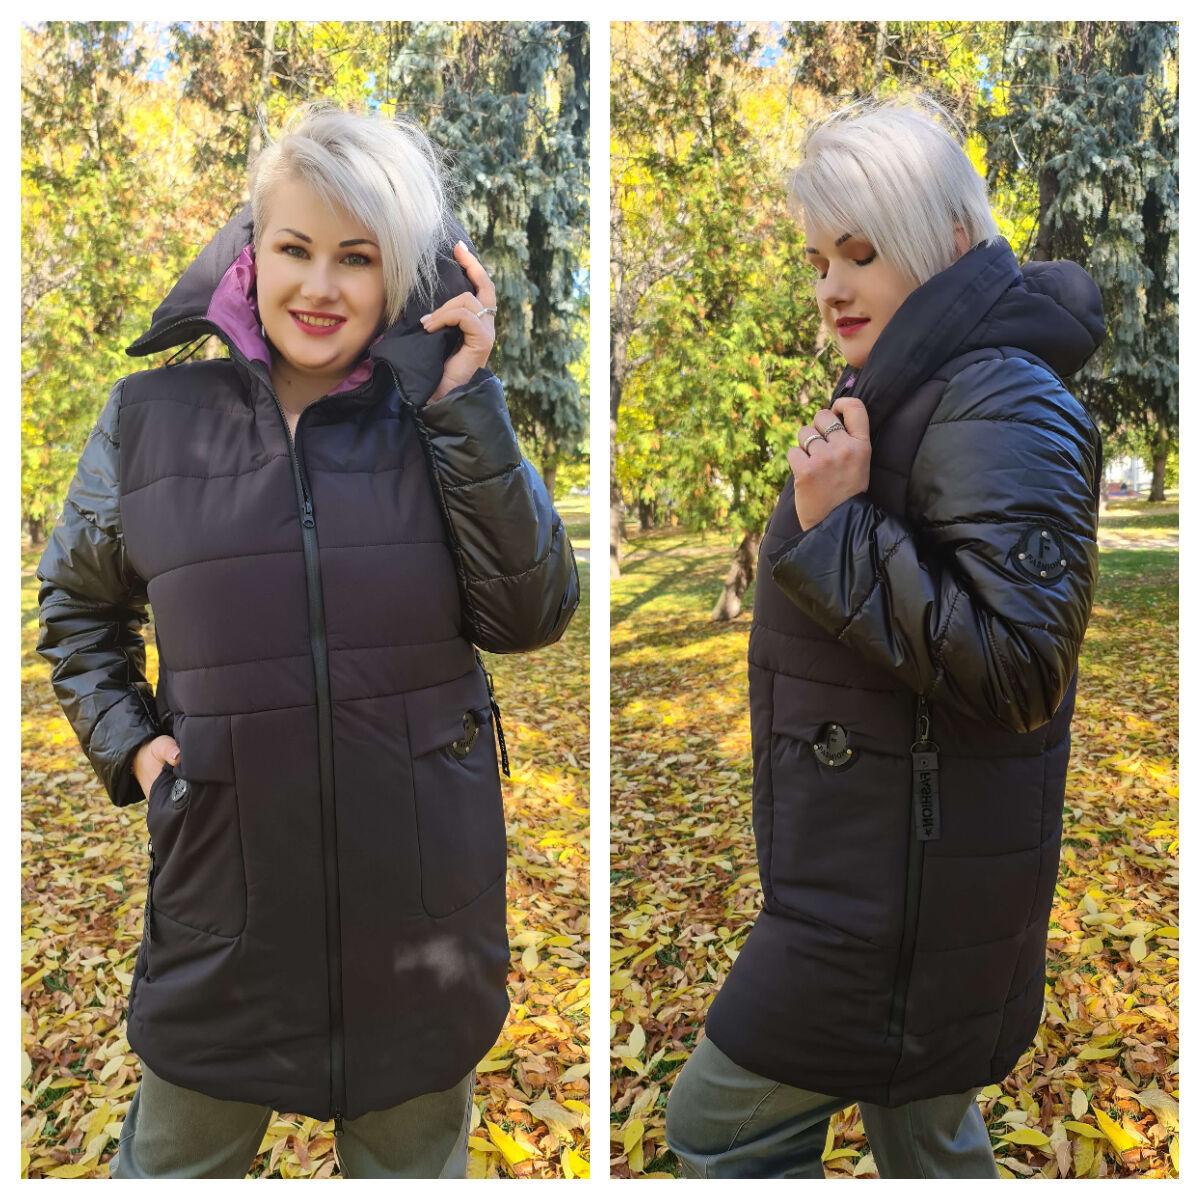 Bori kabát - fekete kabát